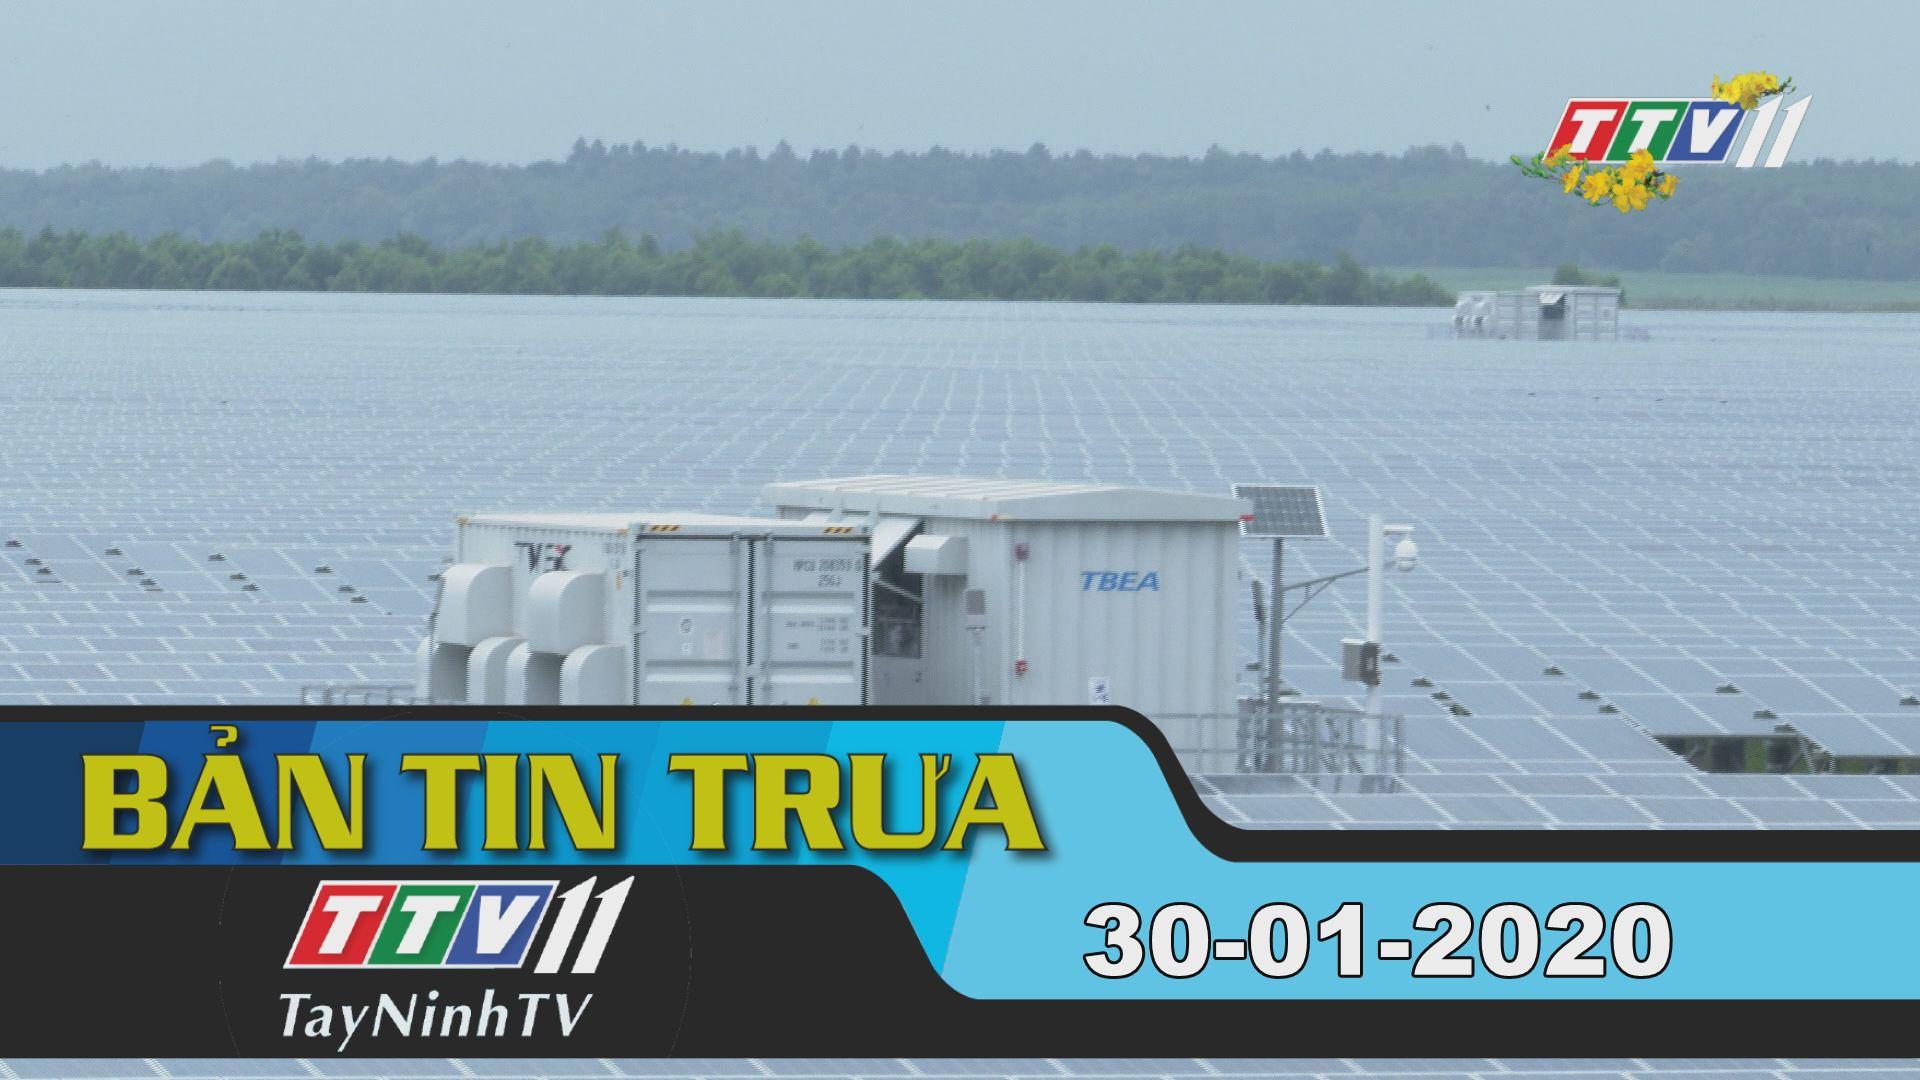 Bản tin trưa 30-01-2020 | Tin tức hôm nay | TayNinhTV